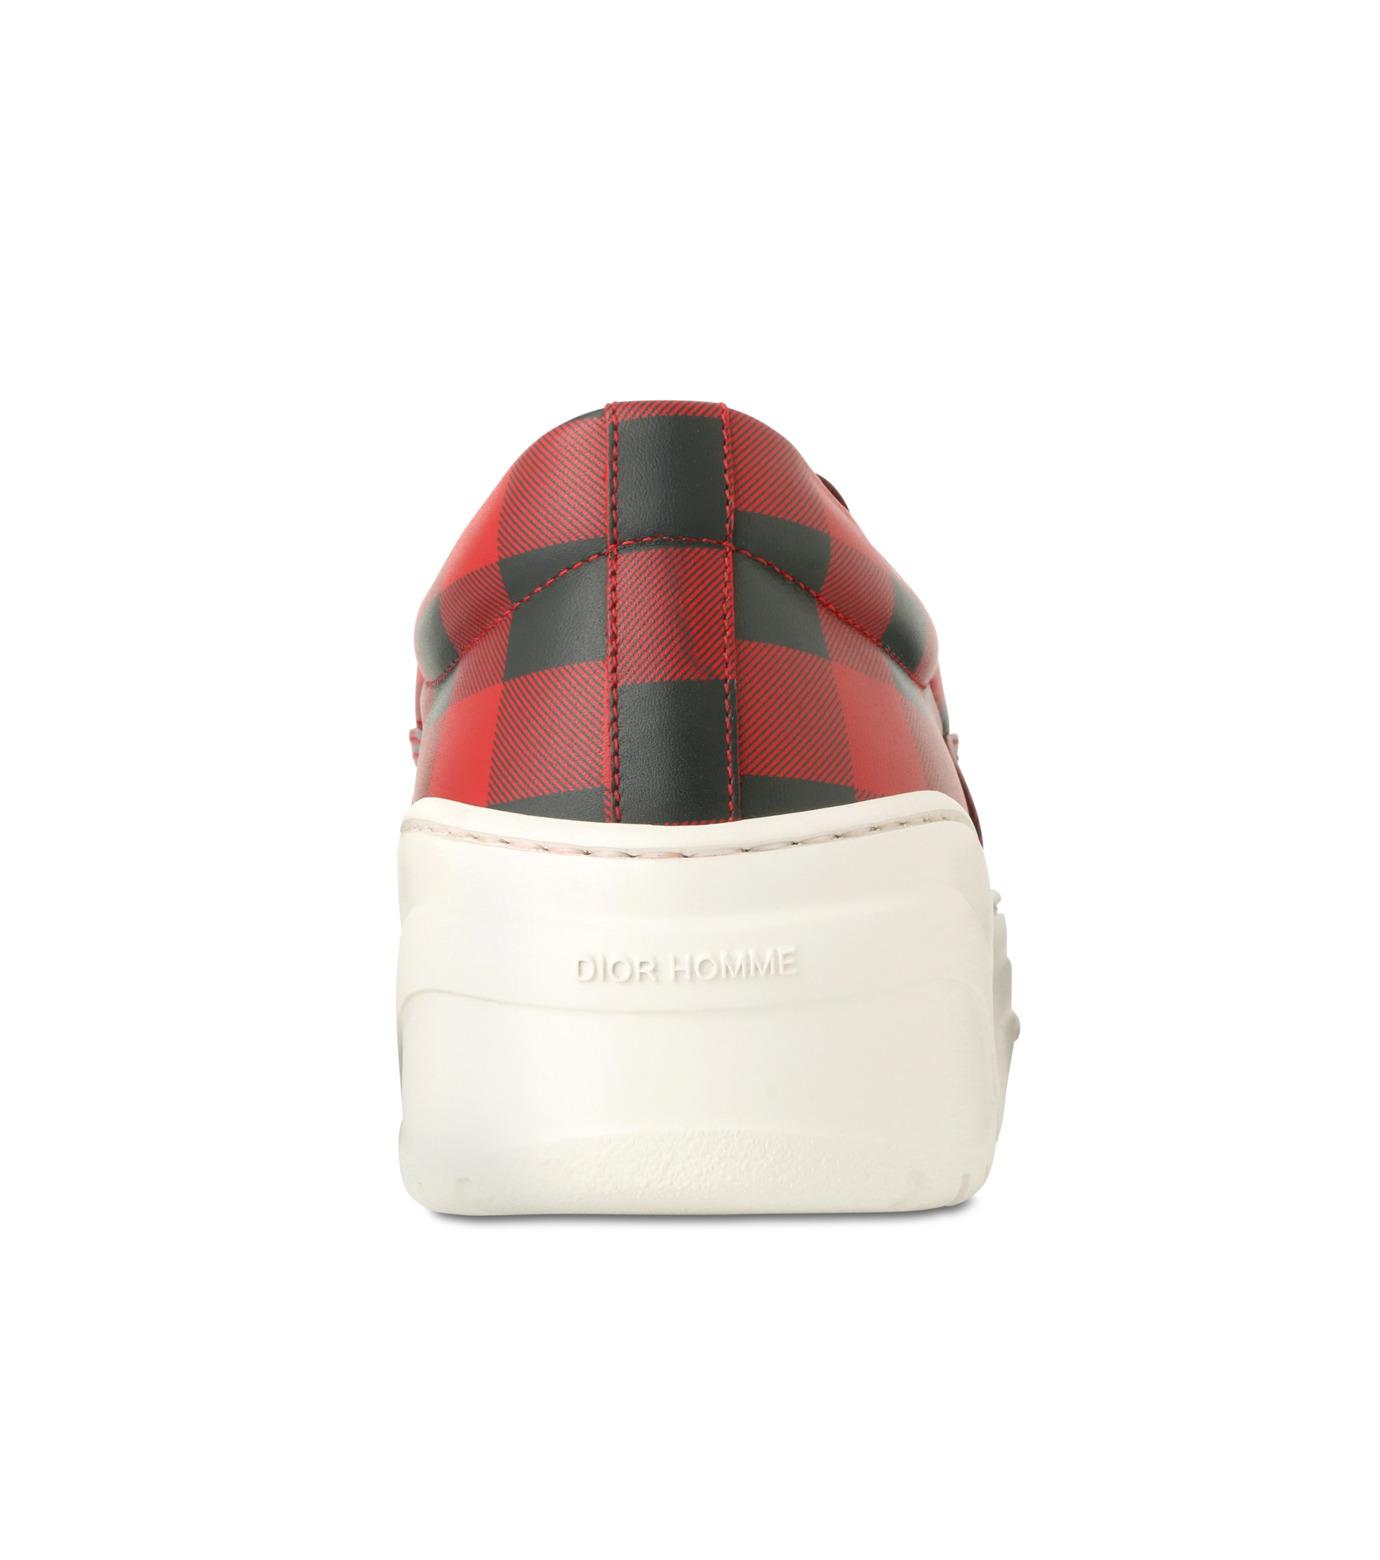 Dior Homme(ディオール オム)のCheck Slippon-RED(スニーカー/sneaker)-3SN178-XGW-62 拡大詳細画像2